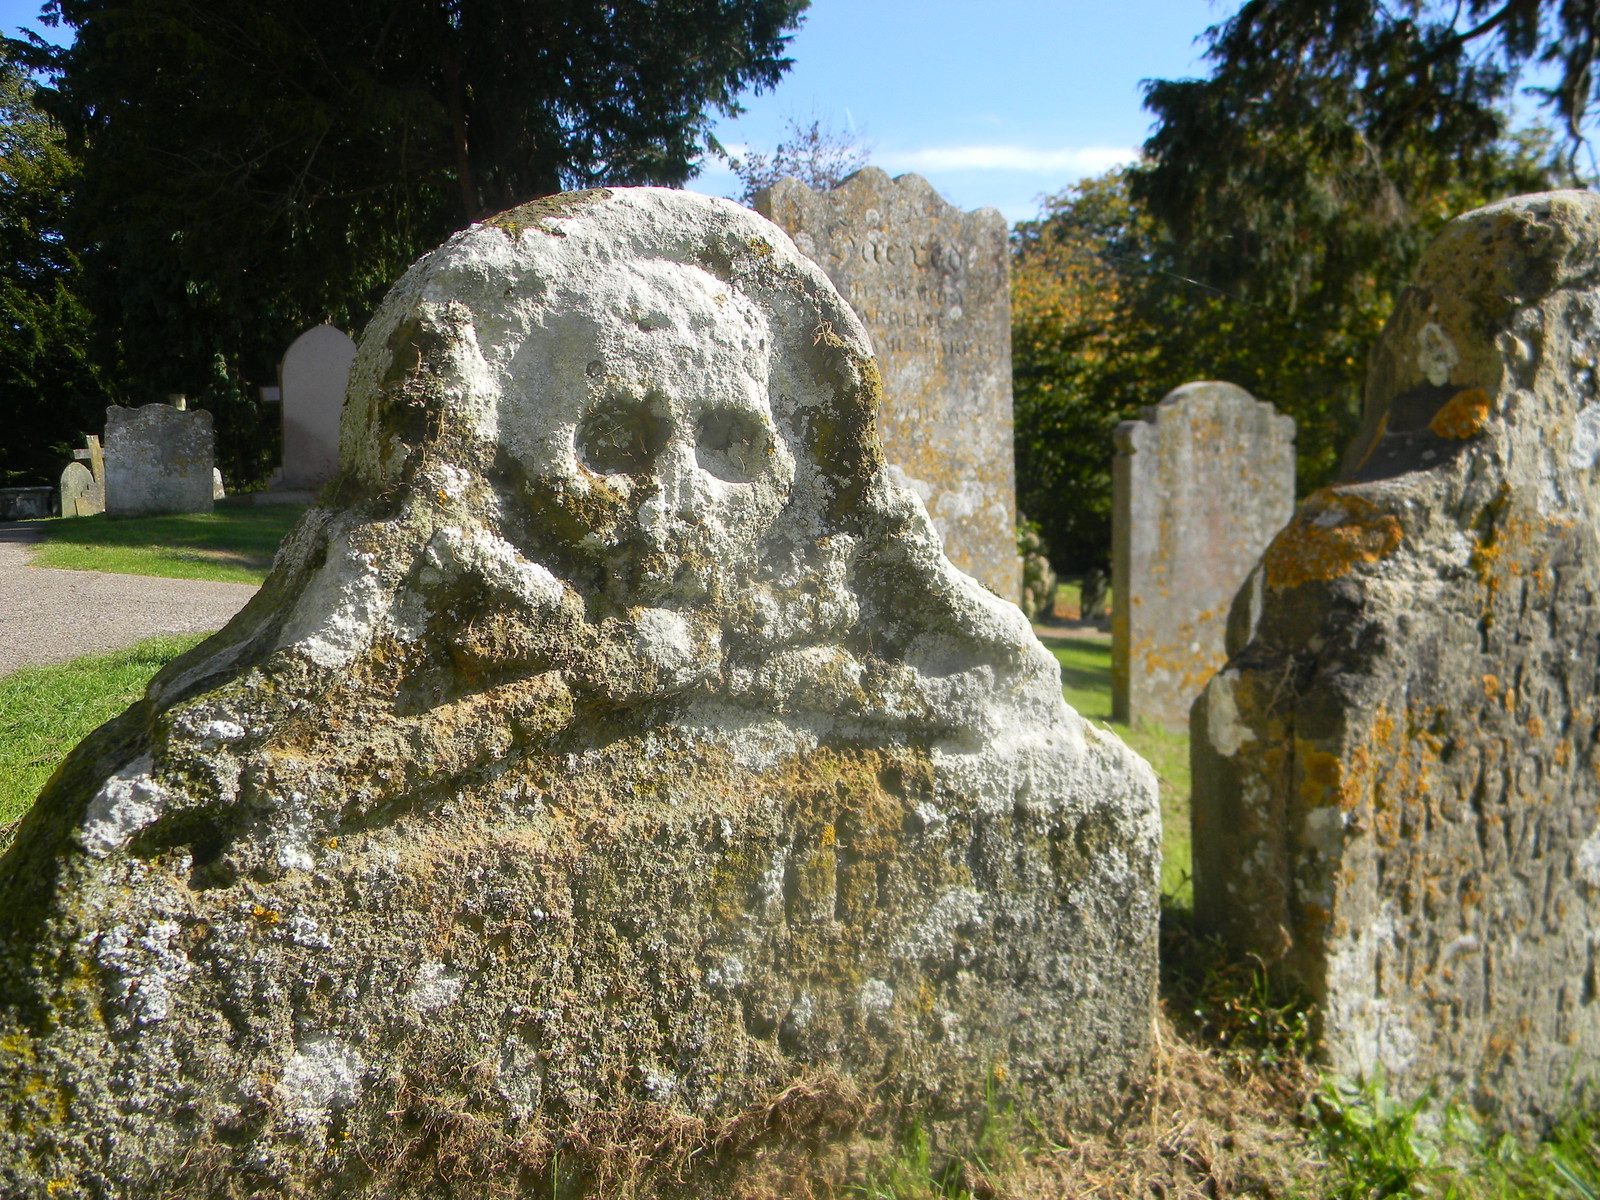 Smugglers grave, Burwash Stonegate Circular